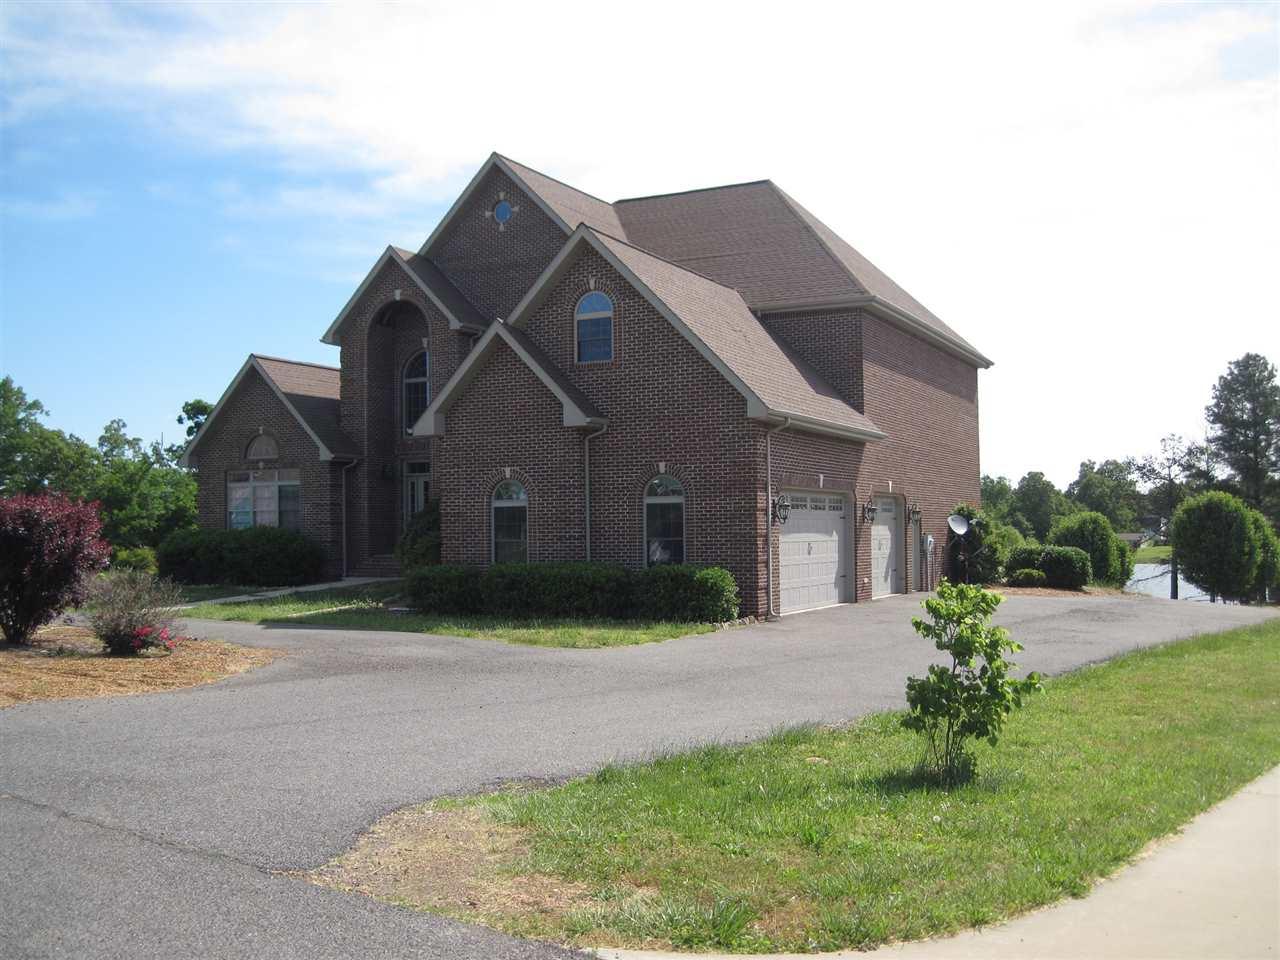 Real Estate for Sale, ListingId: 32052182, Benton,KY42025